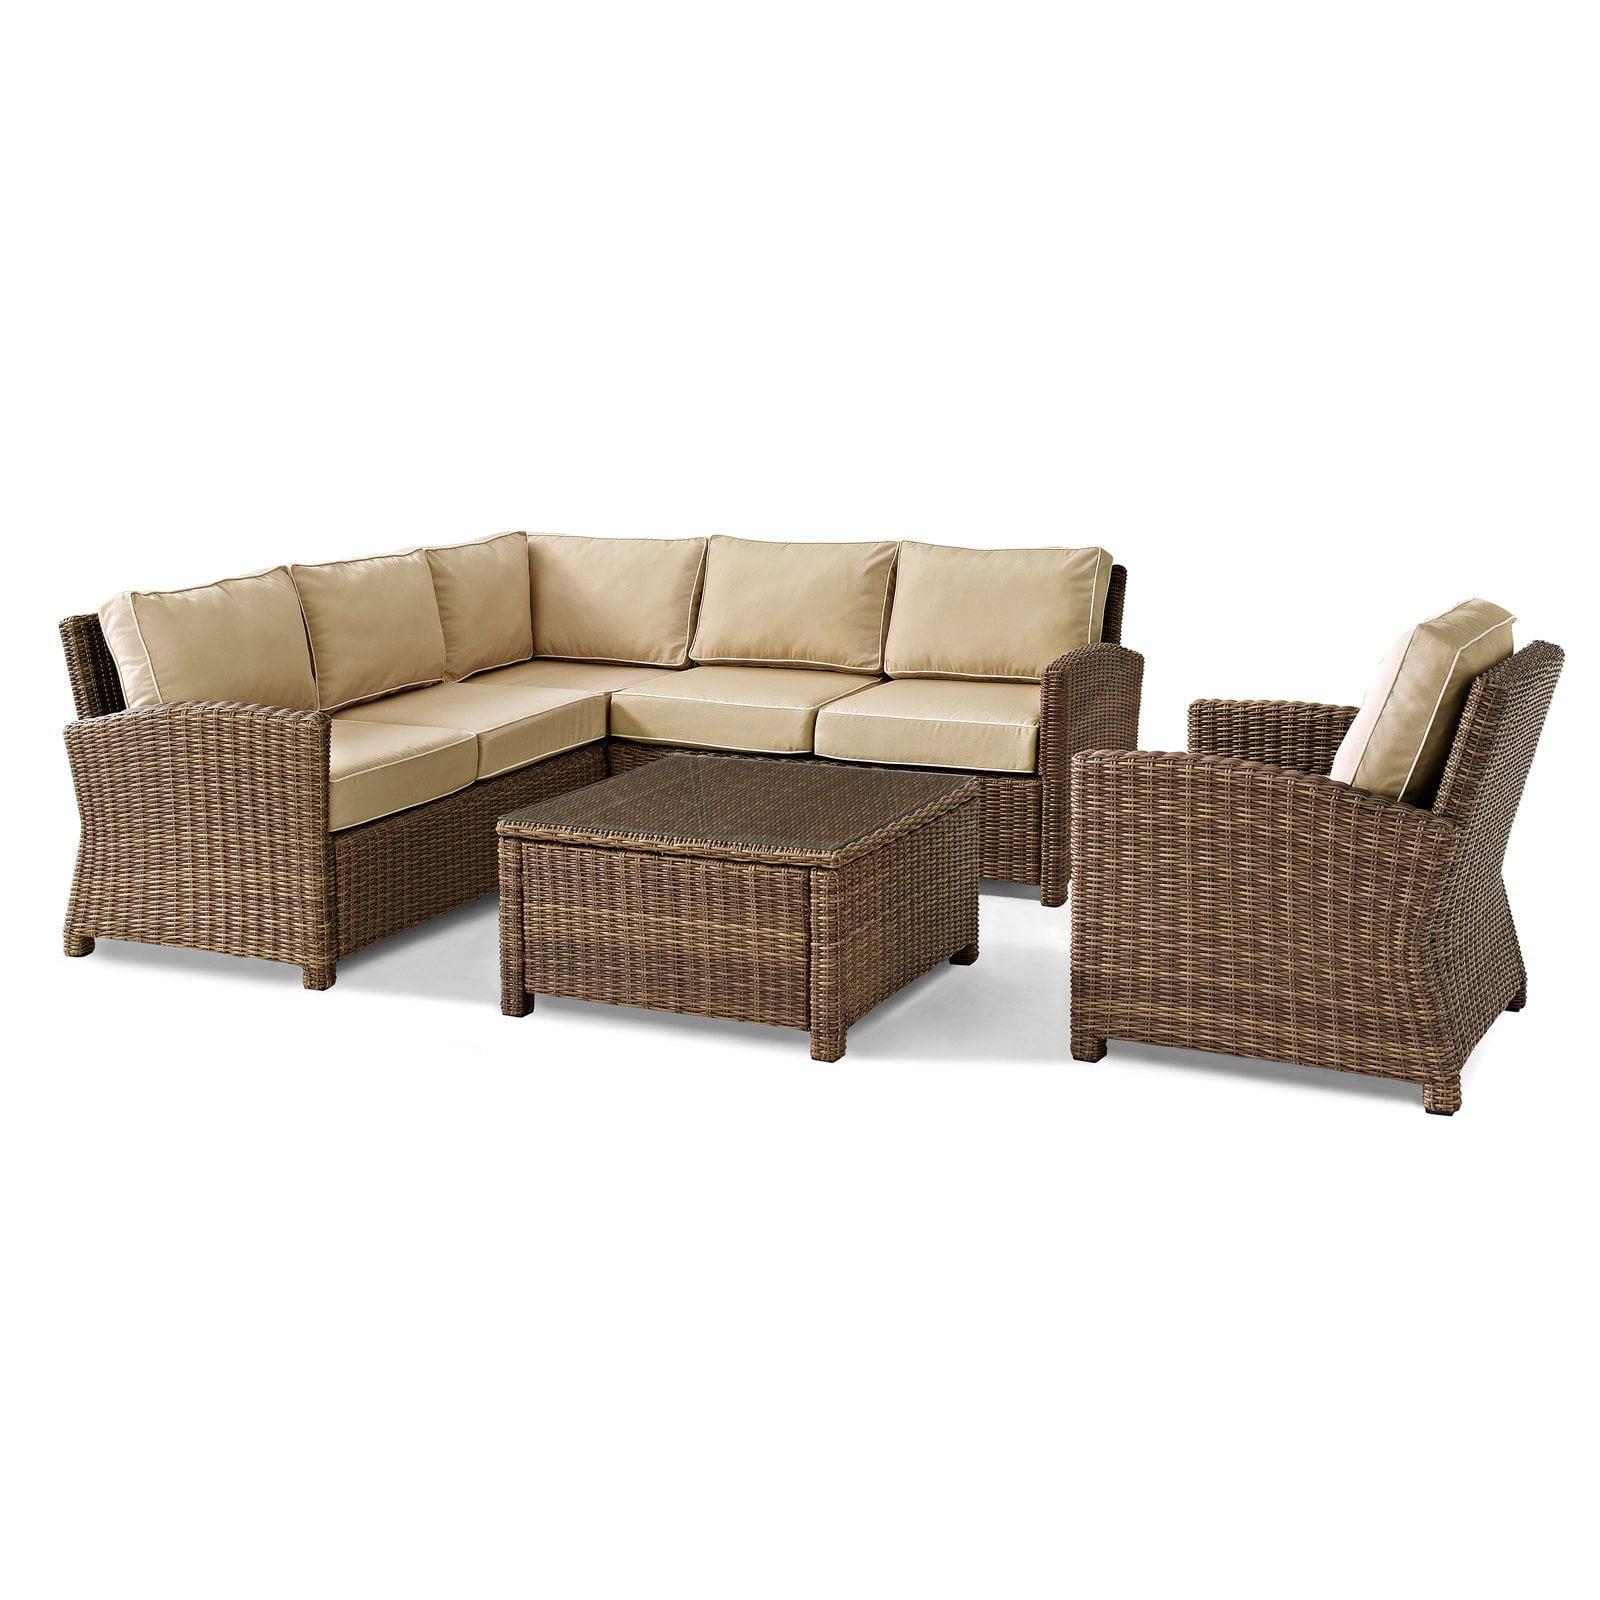 Crosley Furniture Bradenton 5 Piece Outdoor Wicker Seating Set